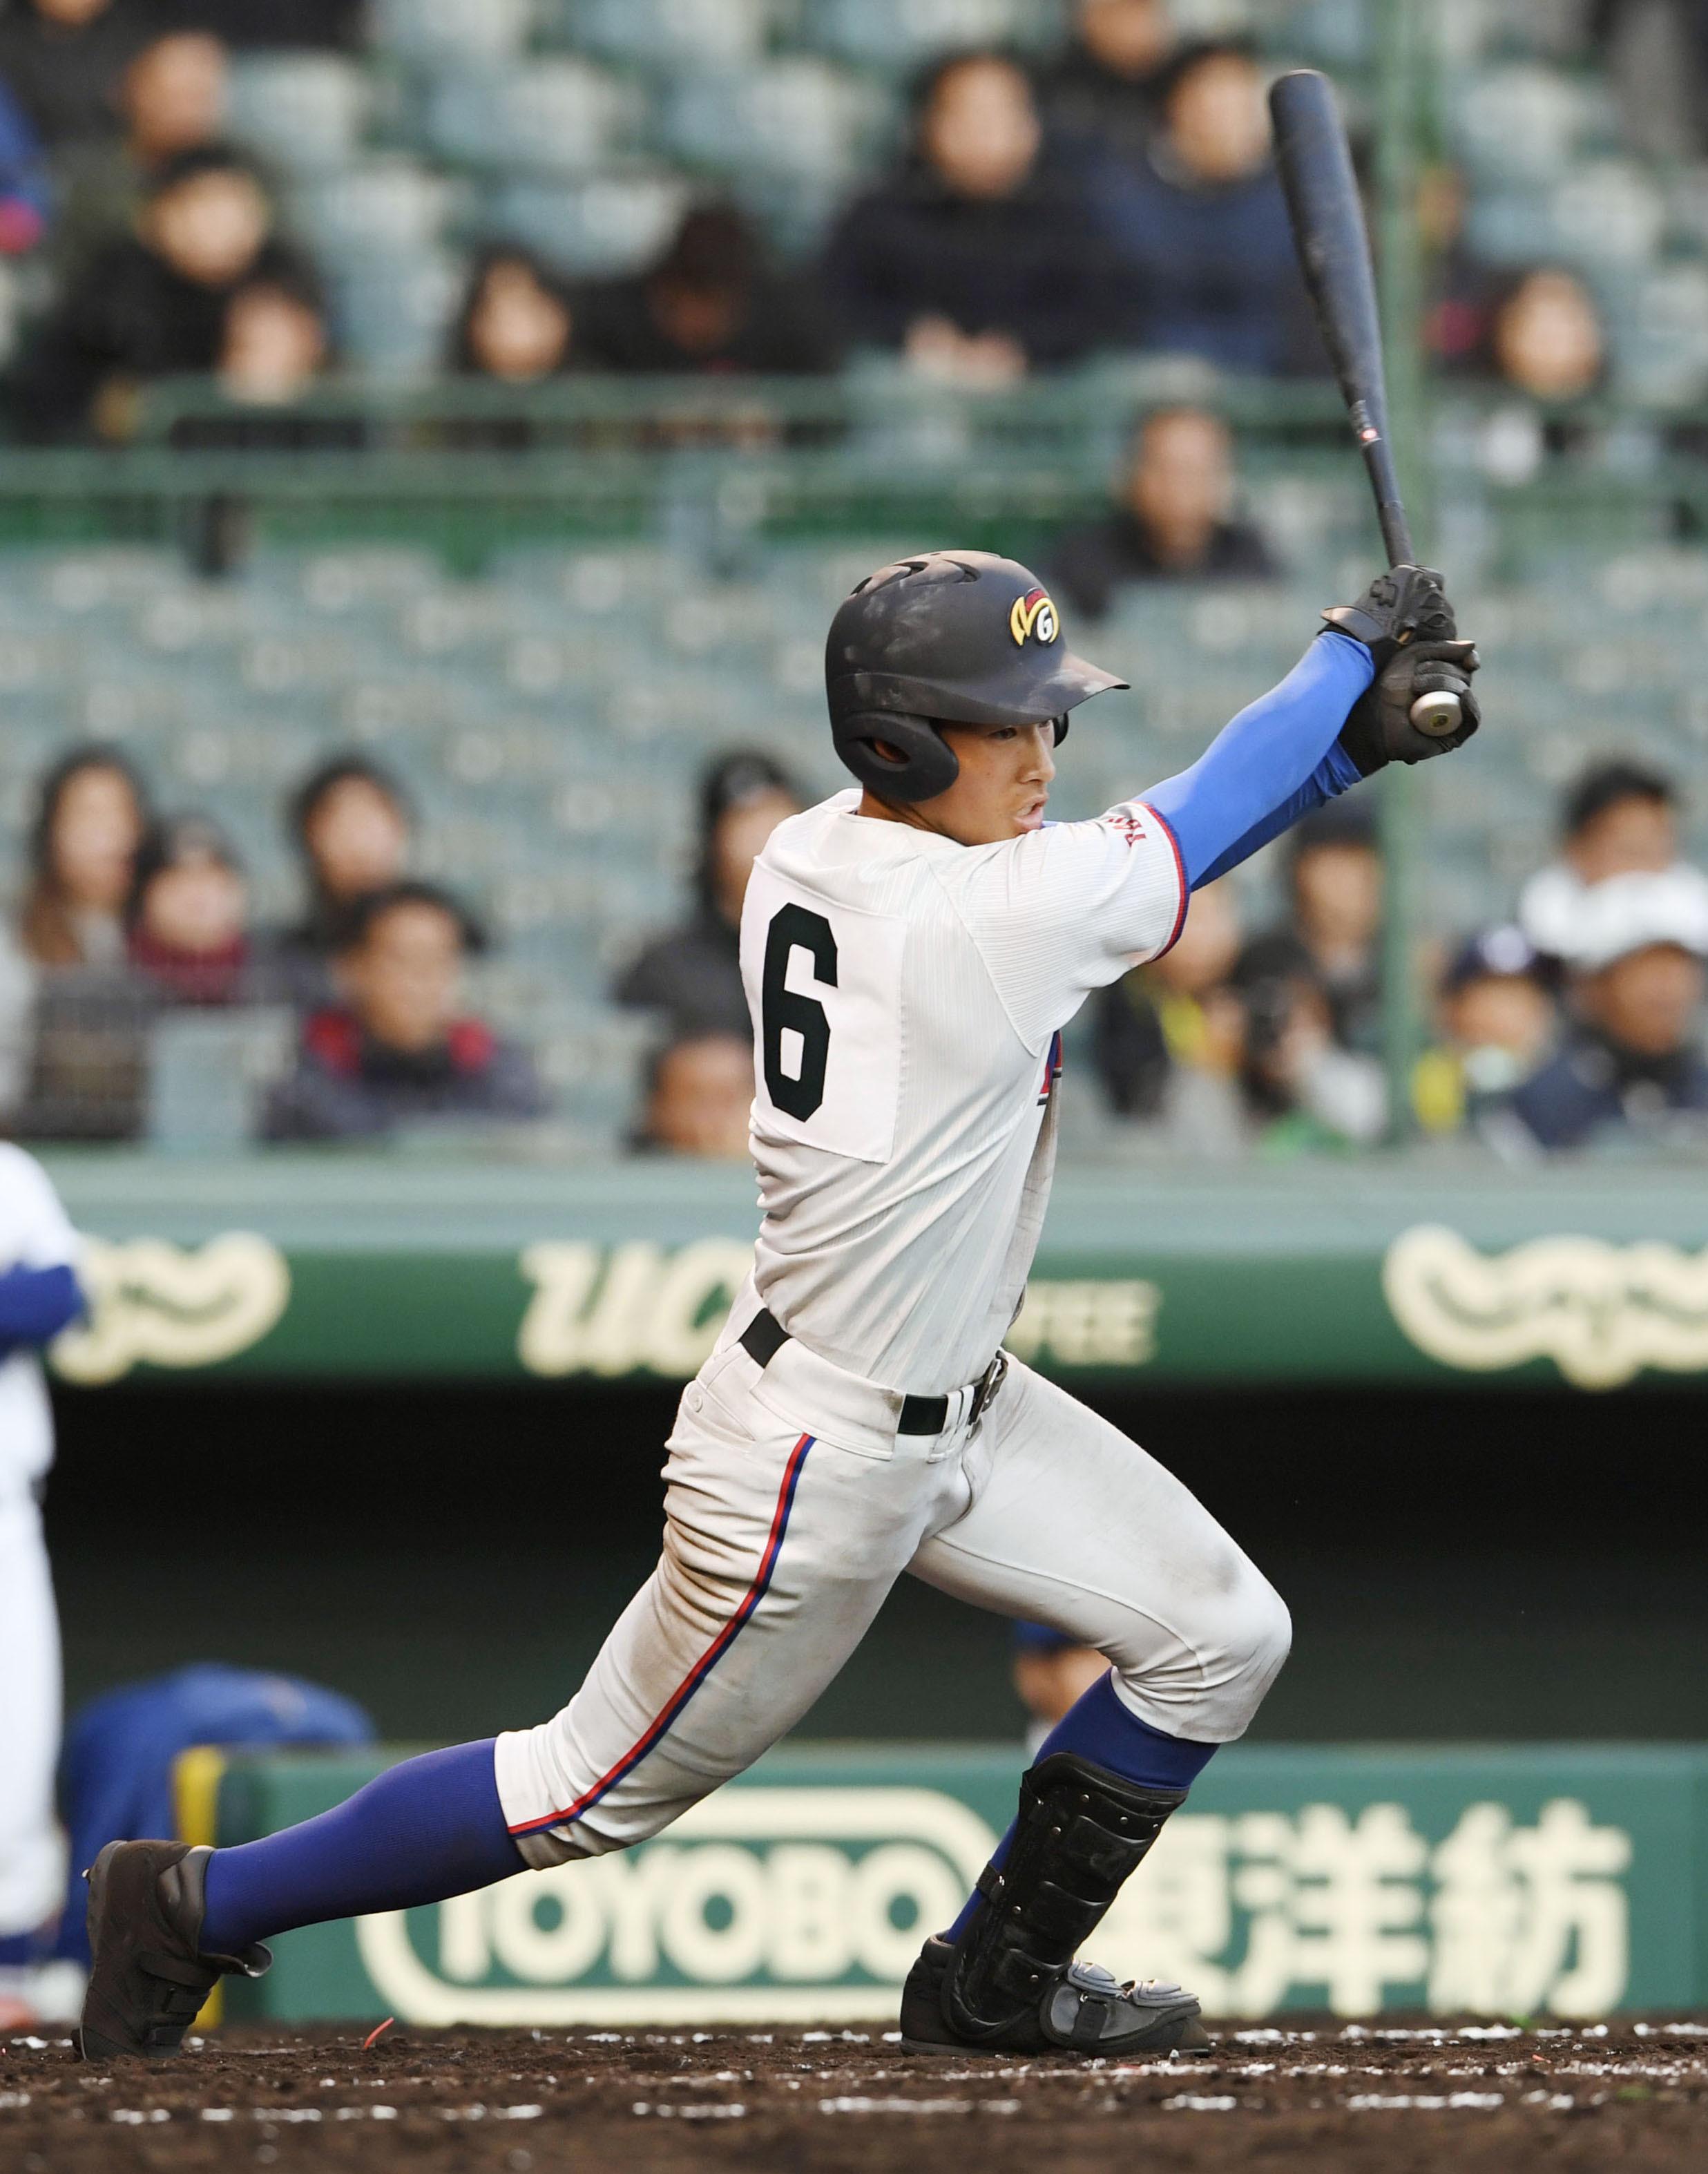 BASEBALL GATE              高校野球            フェンス直撃の衝撃 巨人・坂本が目標 増田陸(明秀日立)